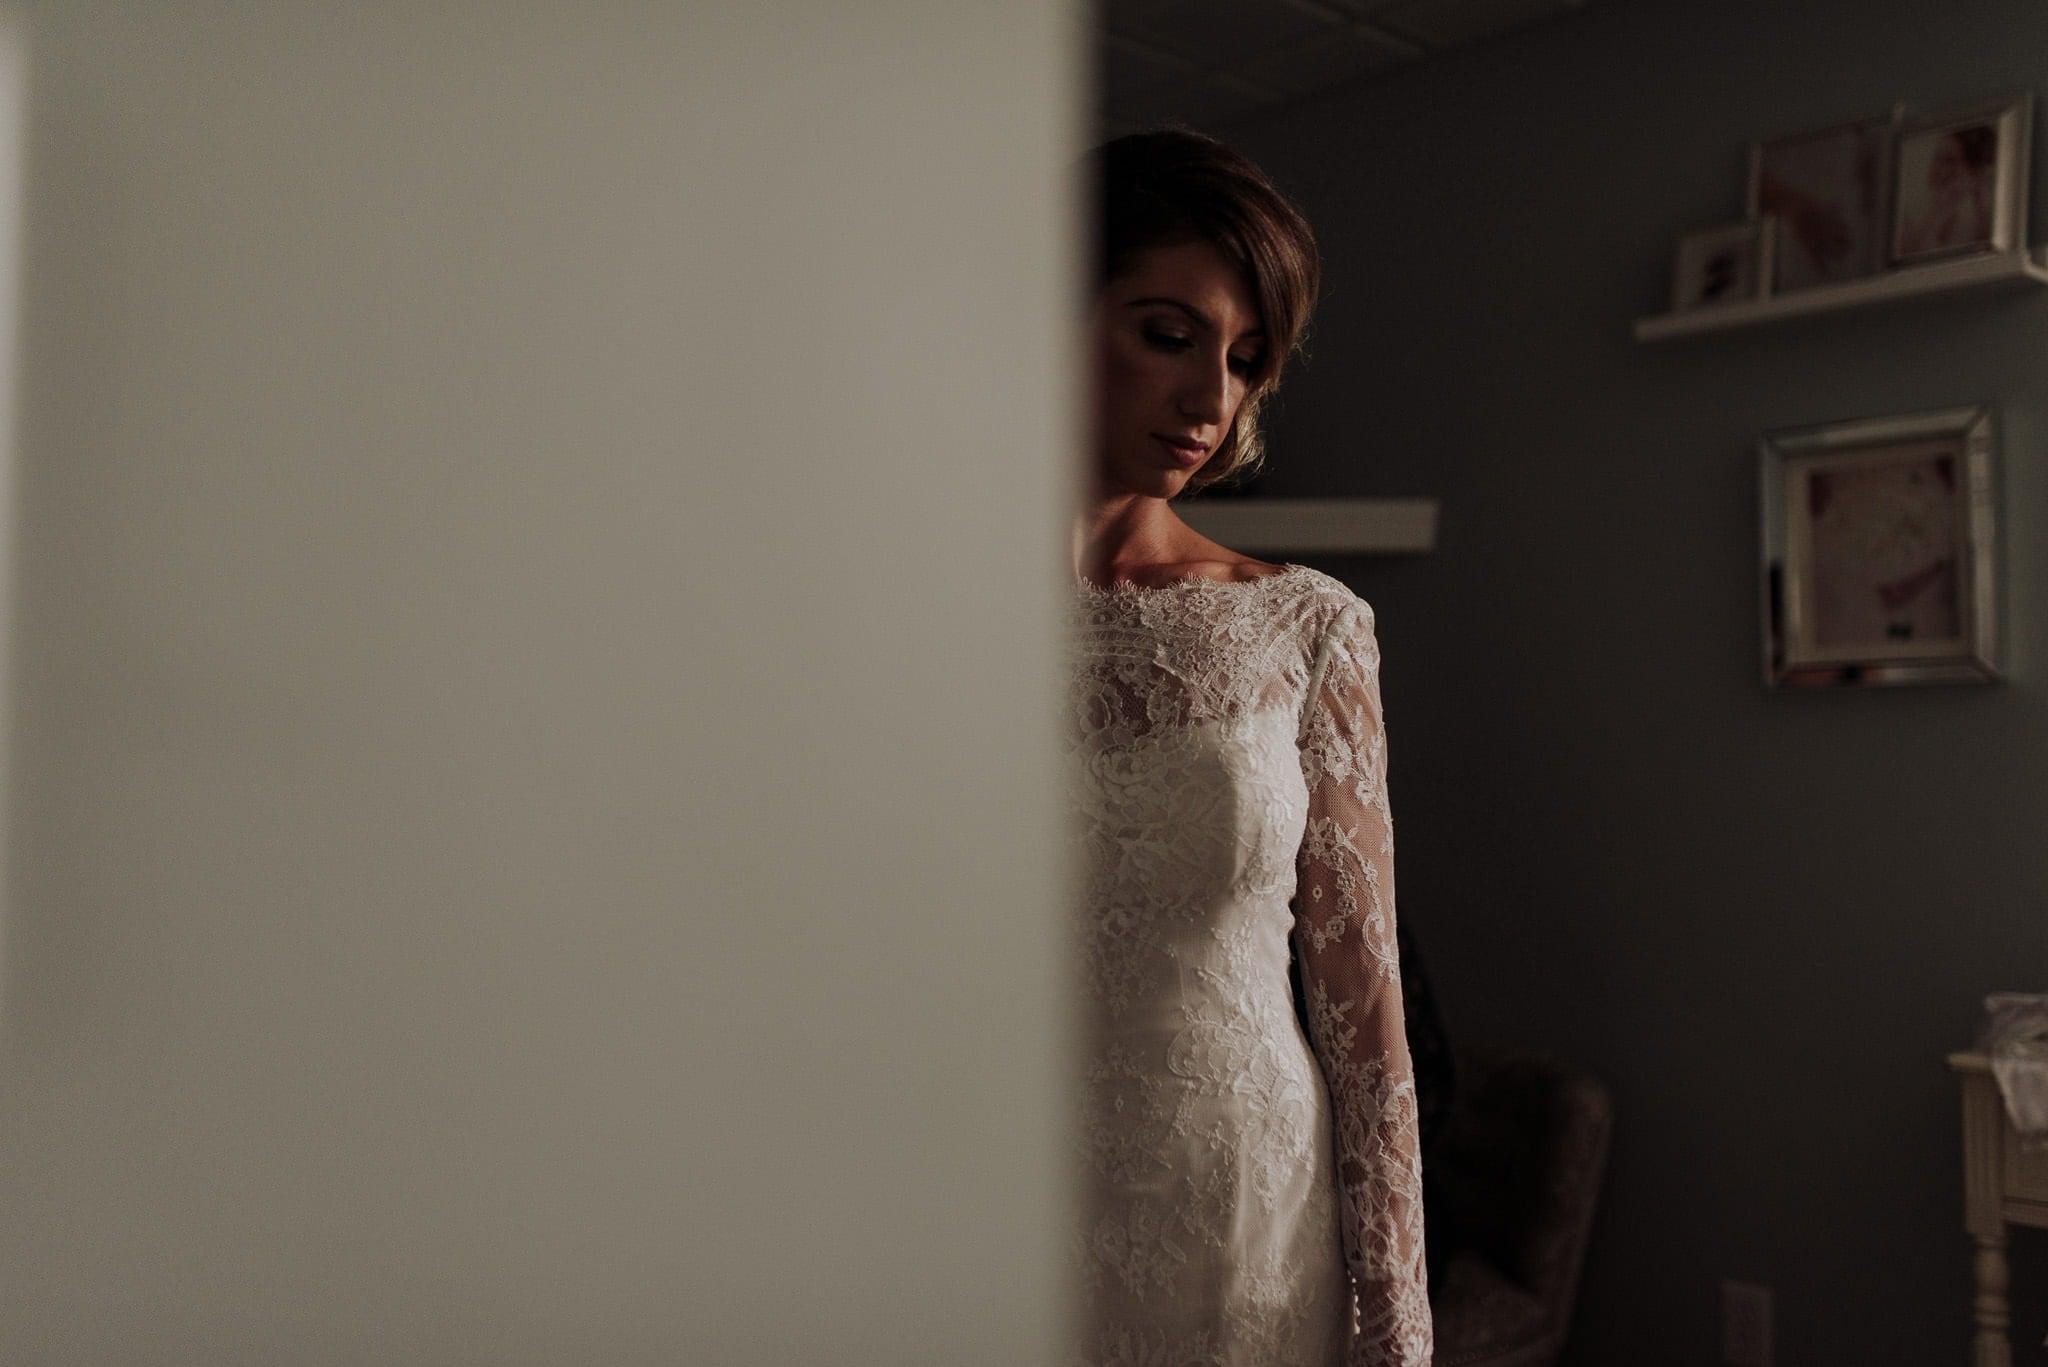 hayloft-on-the-arch-wedding-16